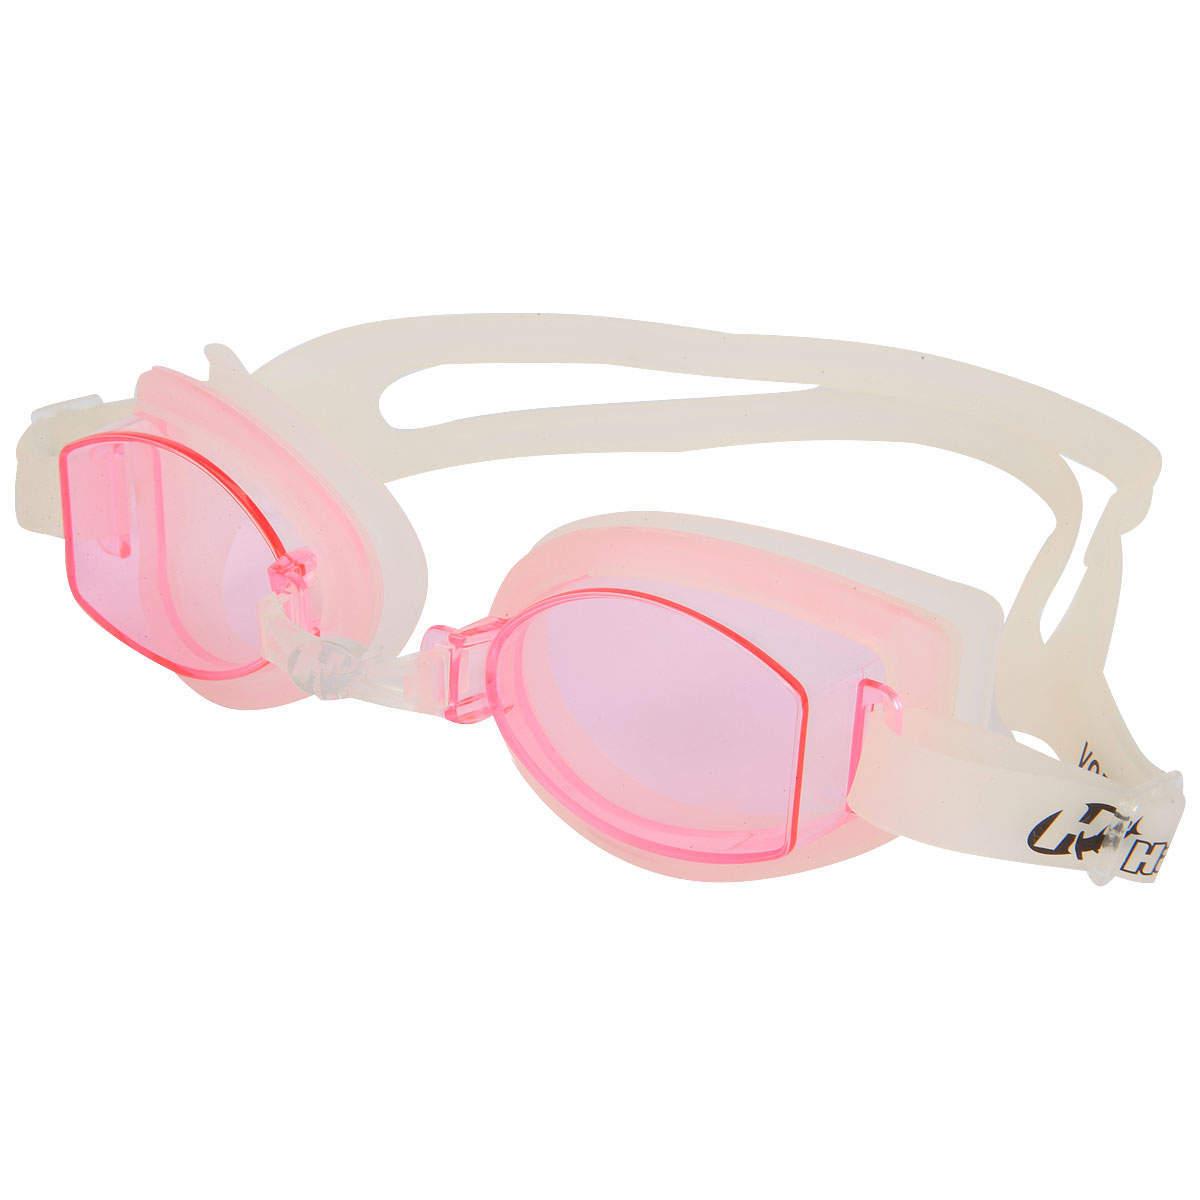 Oculos Vortex 4.0 Hammerhead-maresolonline.com.br